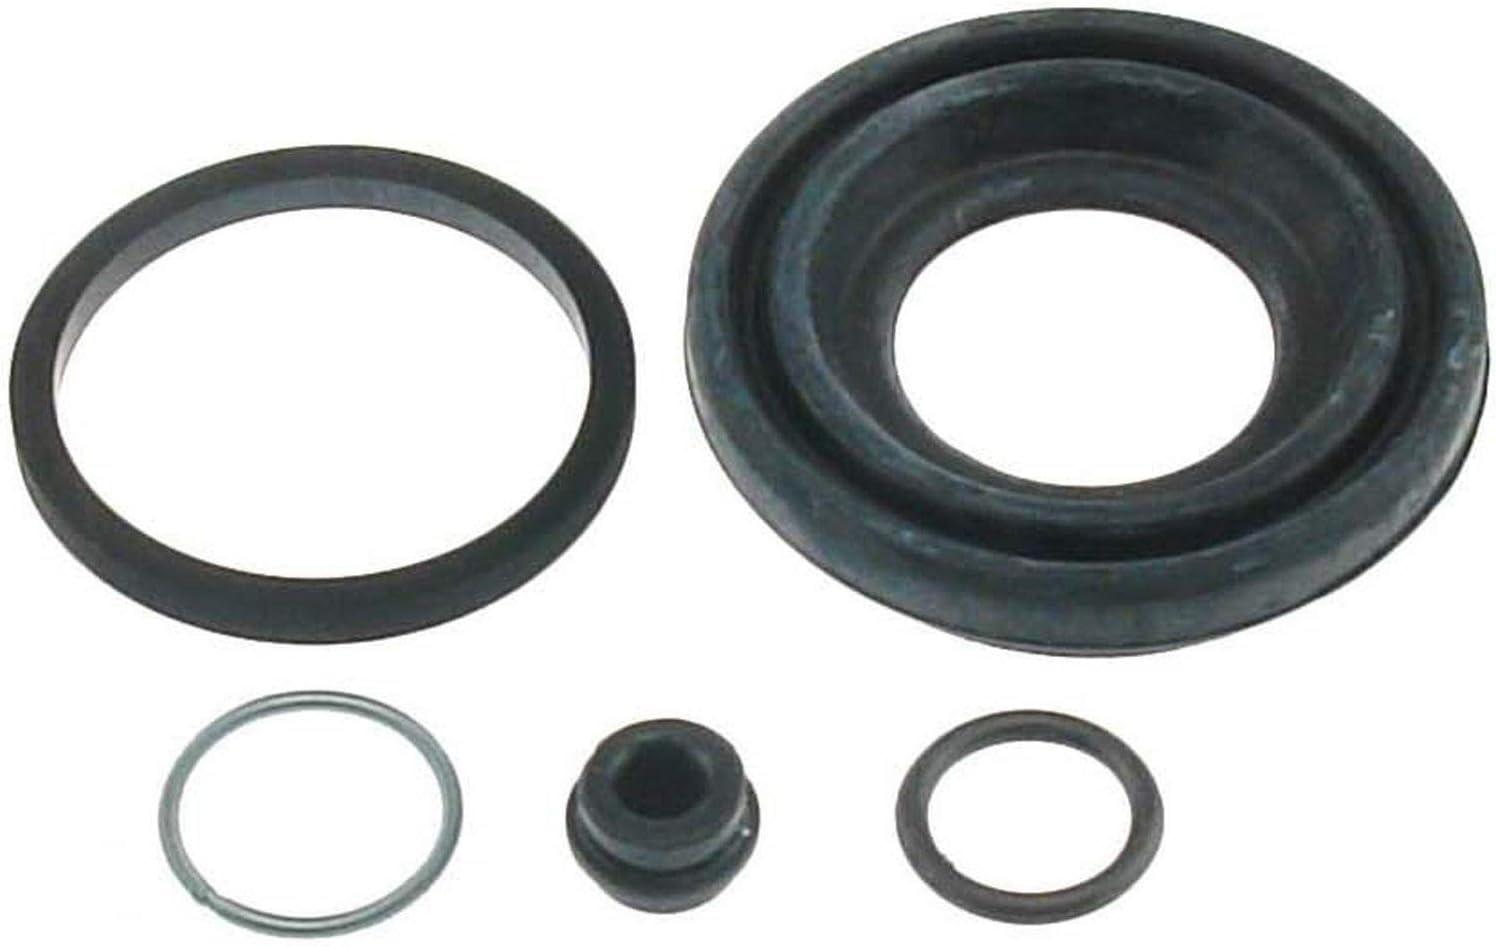 Carlson Quality Brake Parts Caliper Max 81% OFF Kit Denver Mall 15175 Repair